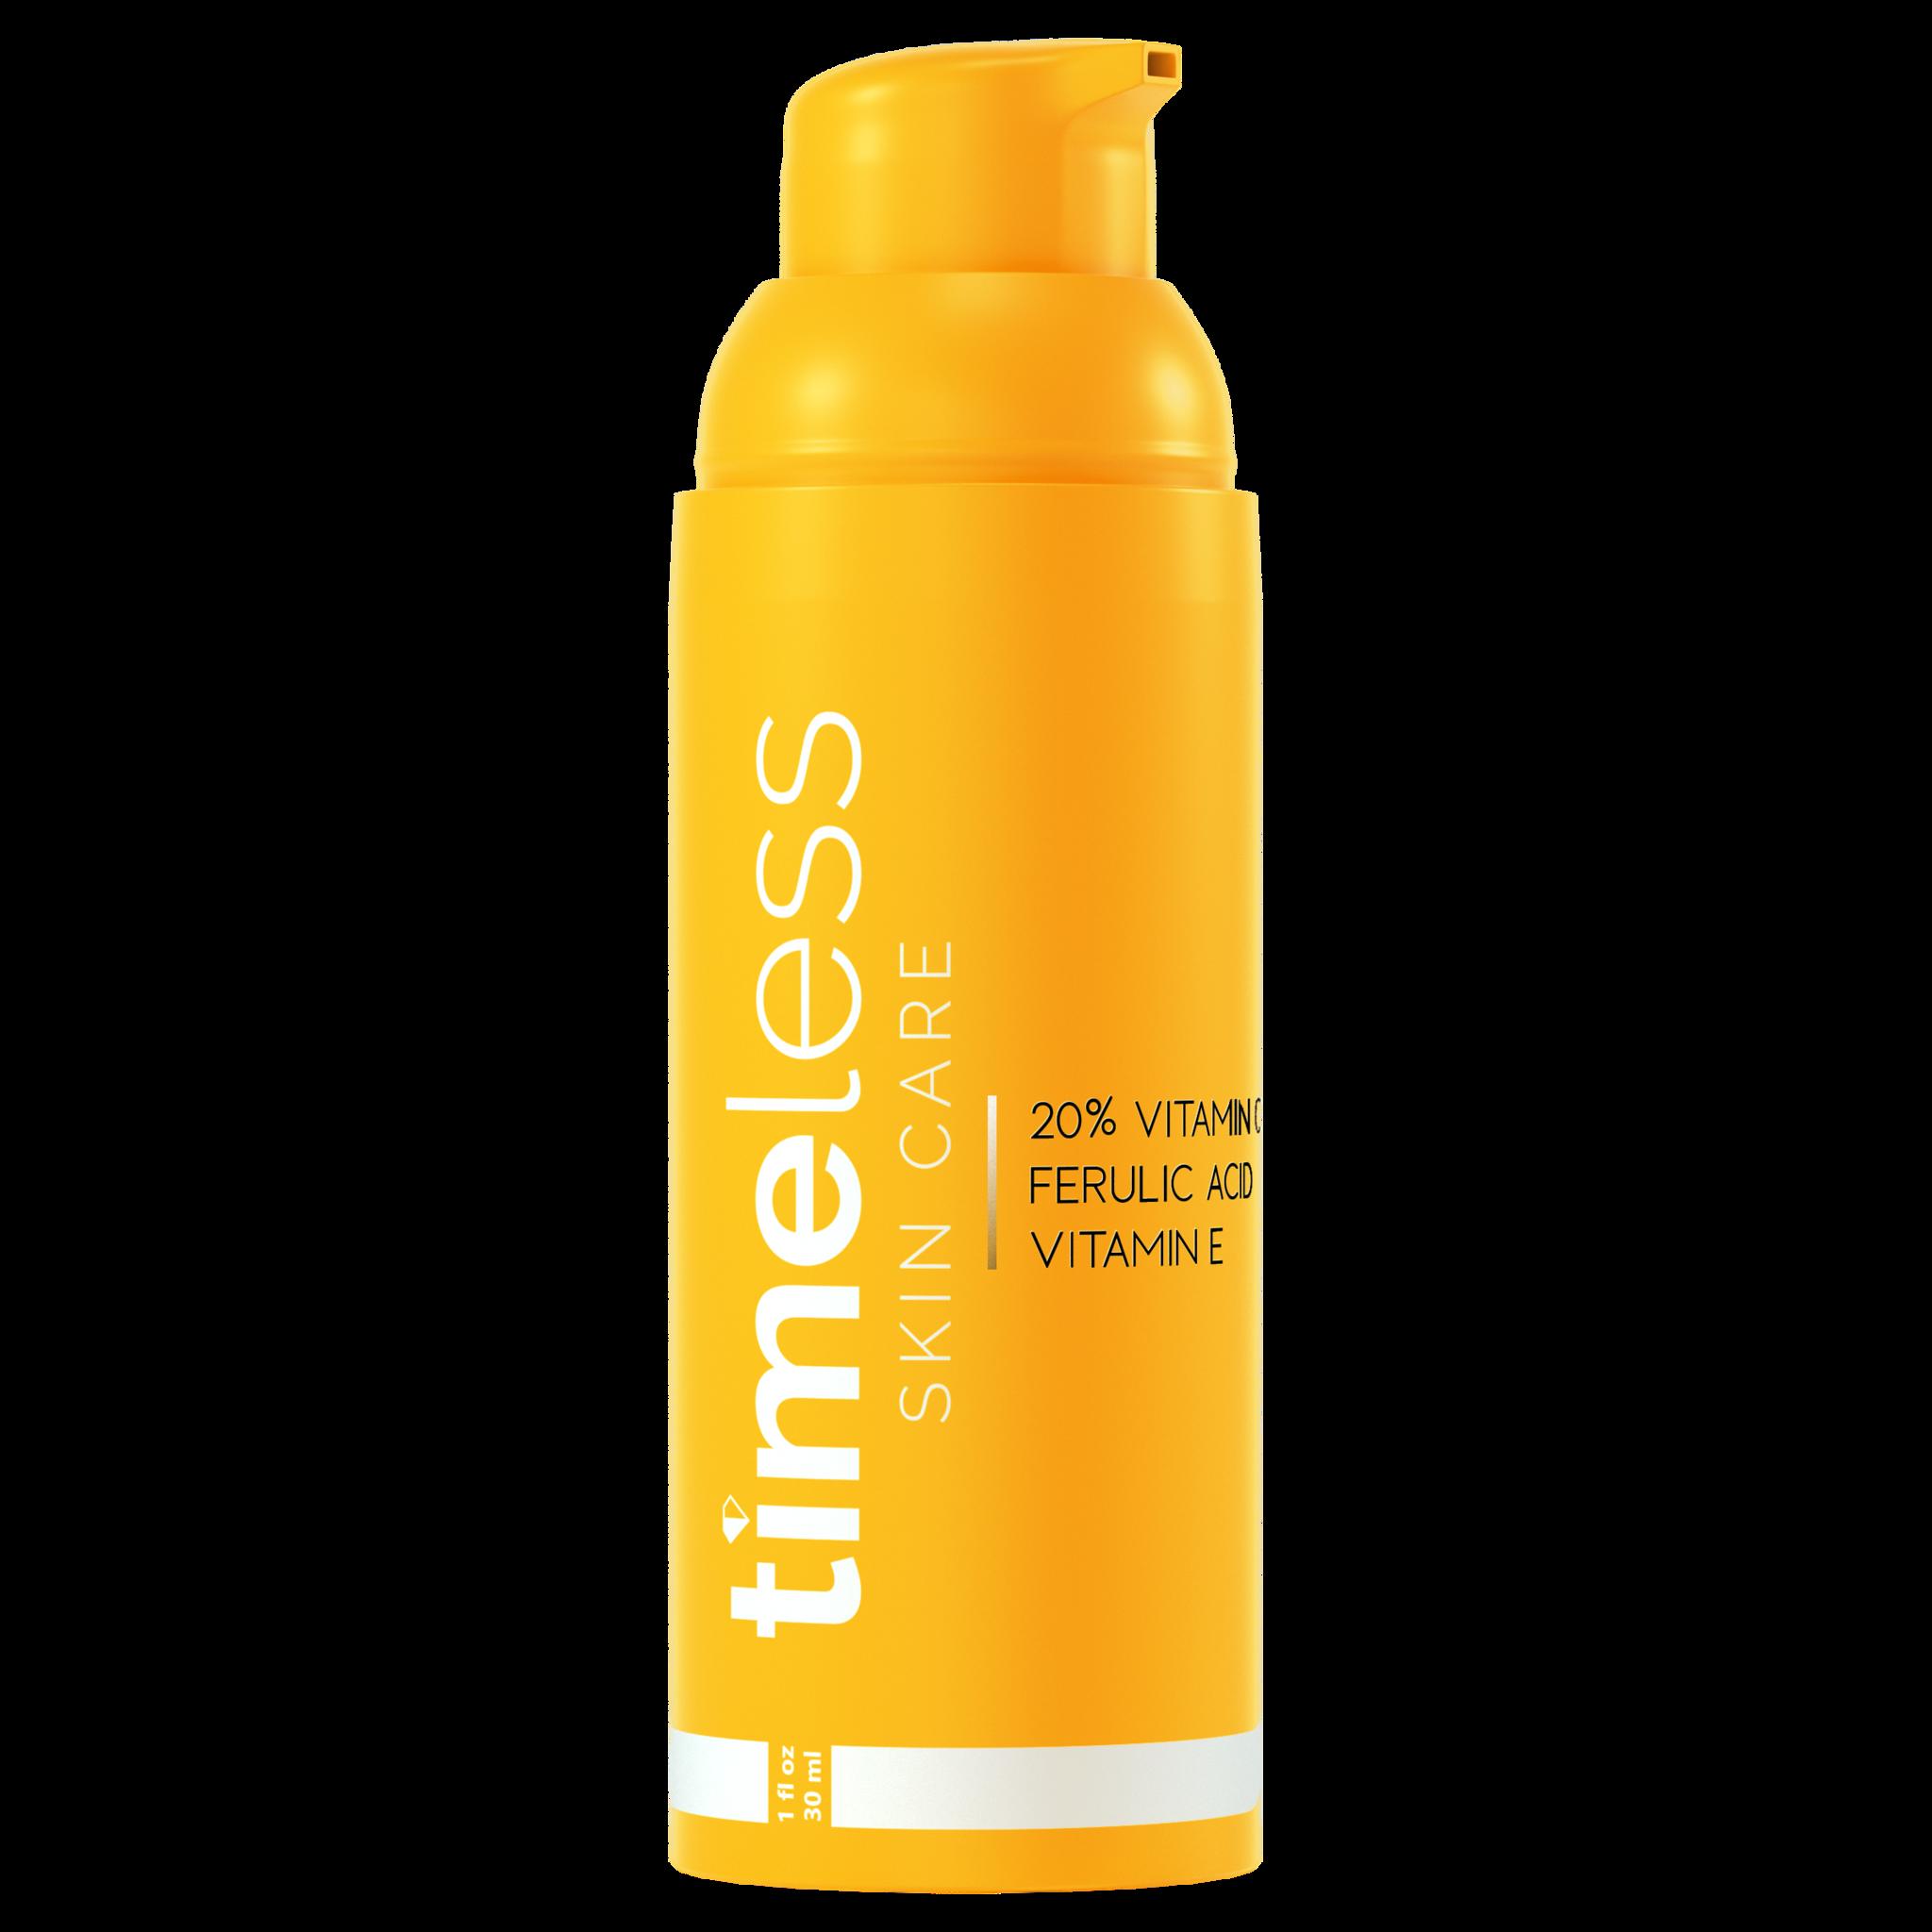 Timeless 20% Витамин C+E феруловая кислота сыворотка